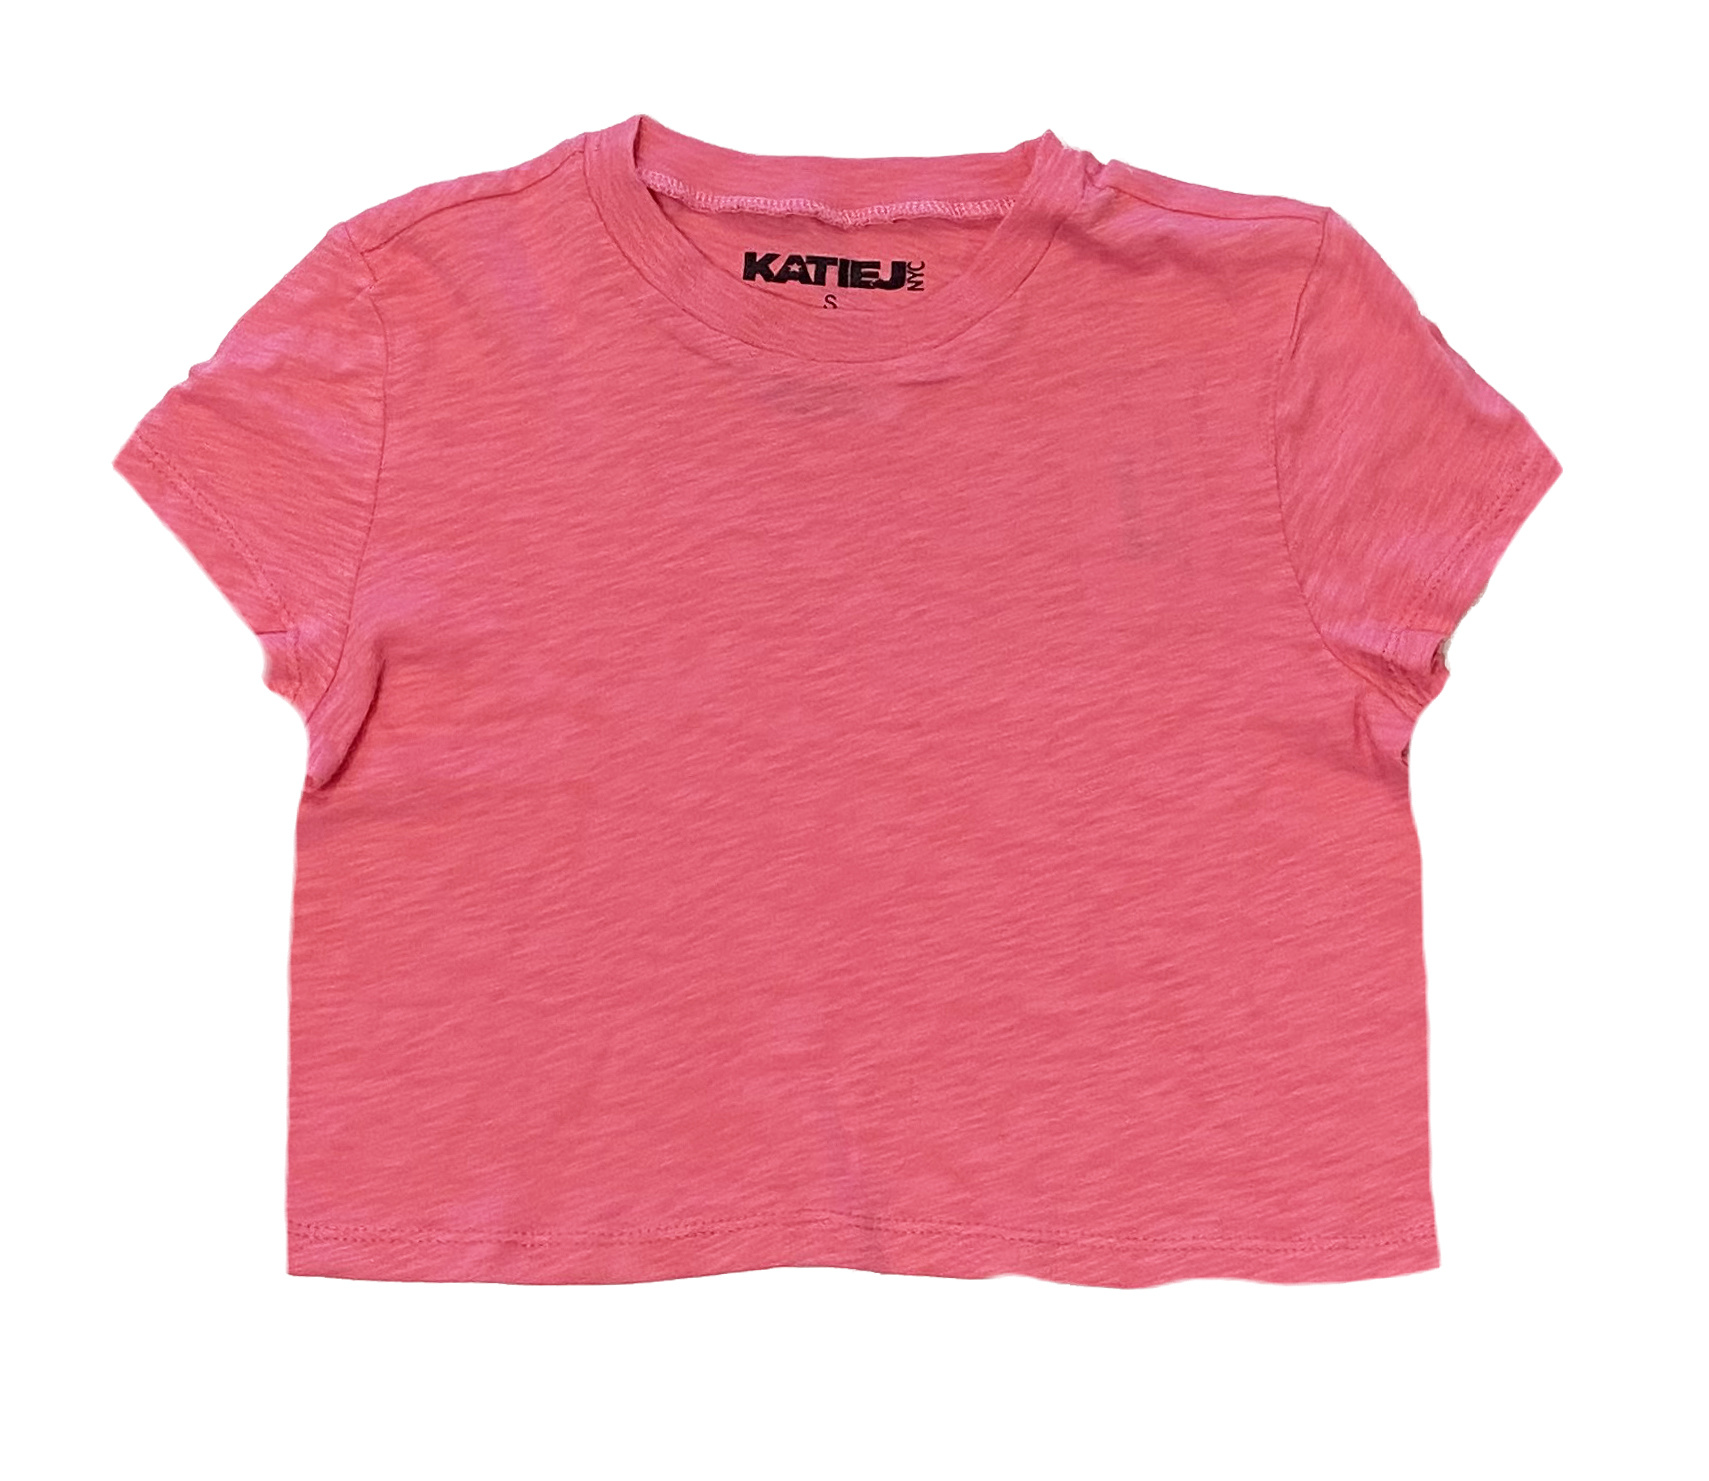 Katie J NYC Crop Slub SS Tee Hot Pink